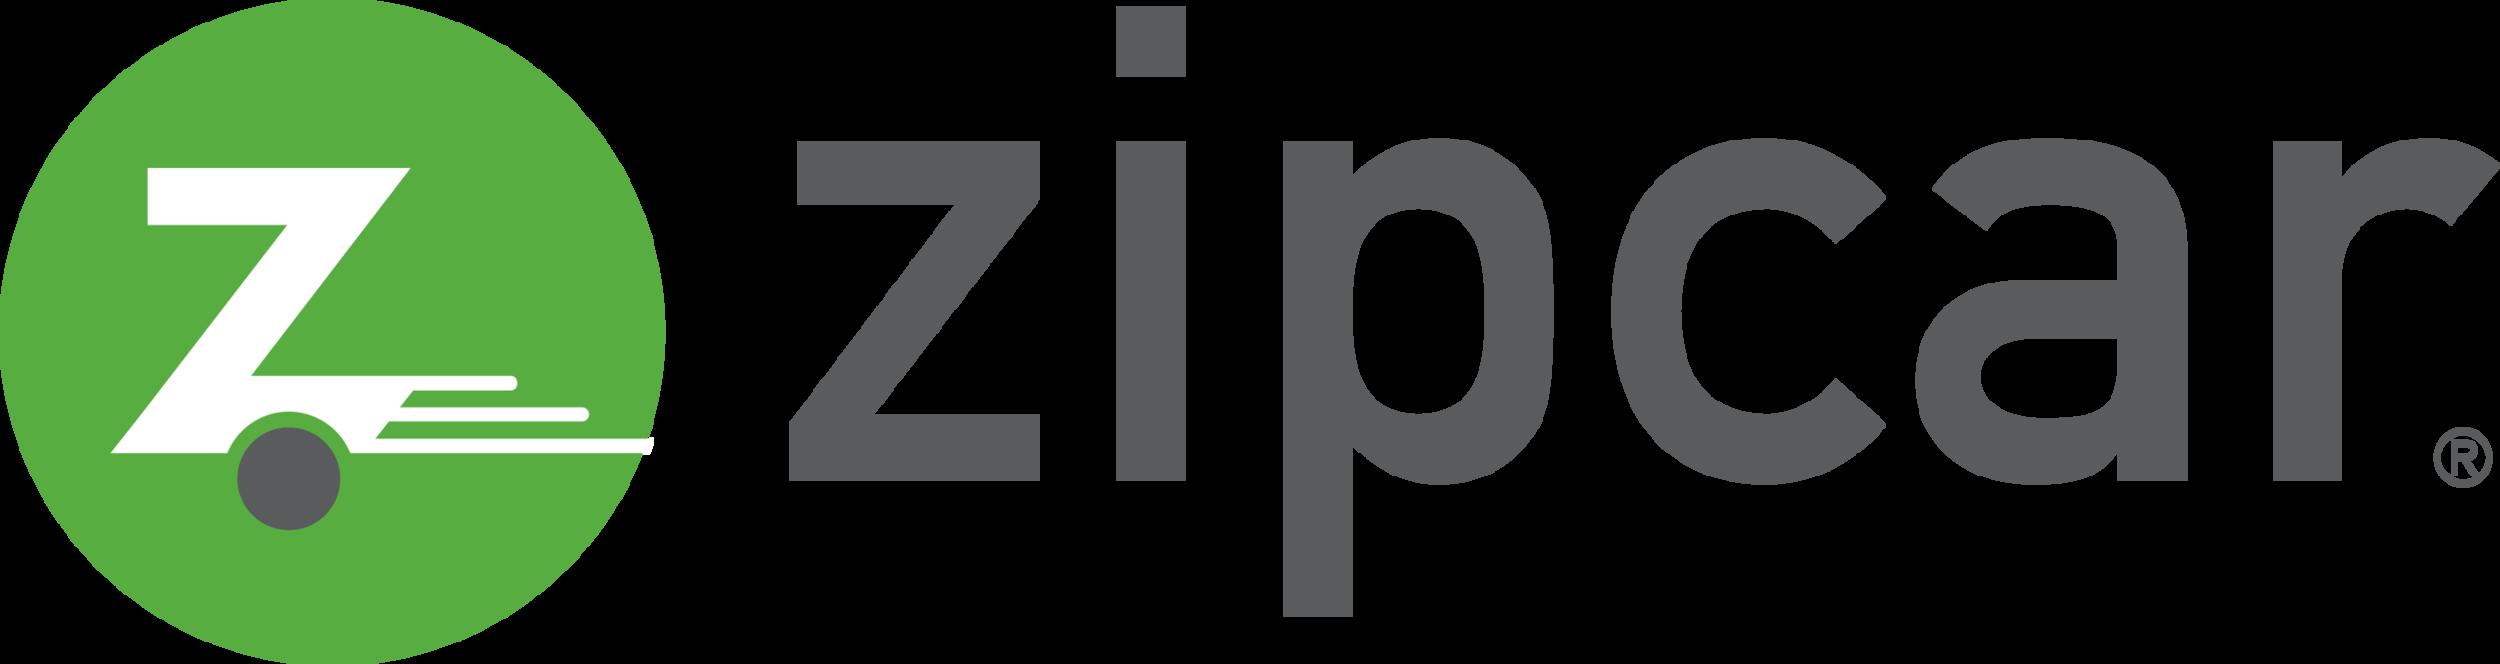 Zipcar_logotype_color_web.png